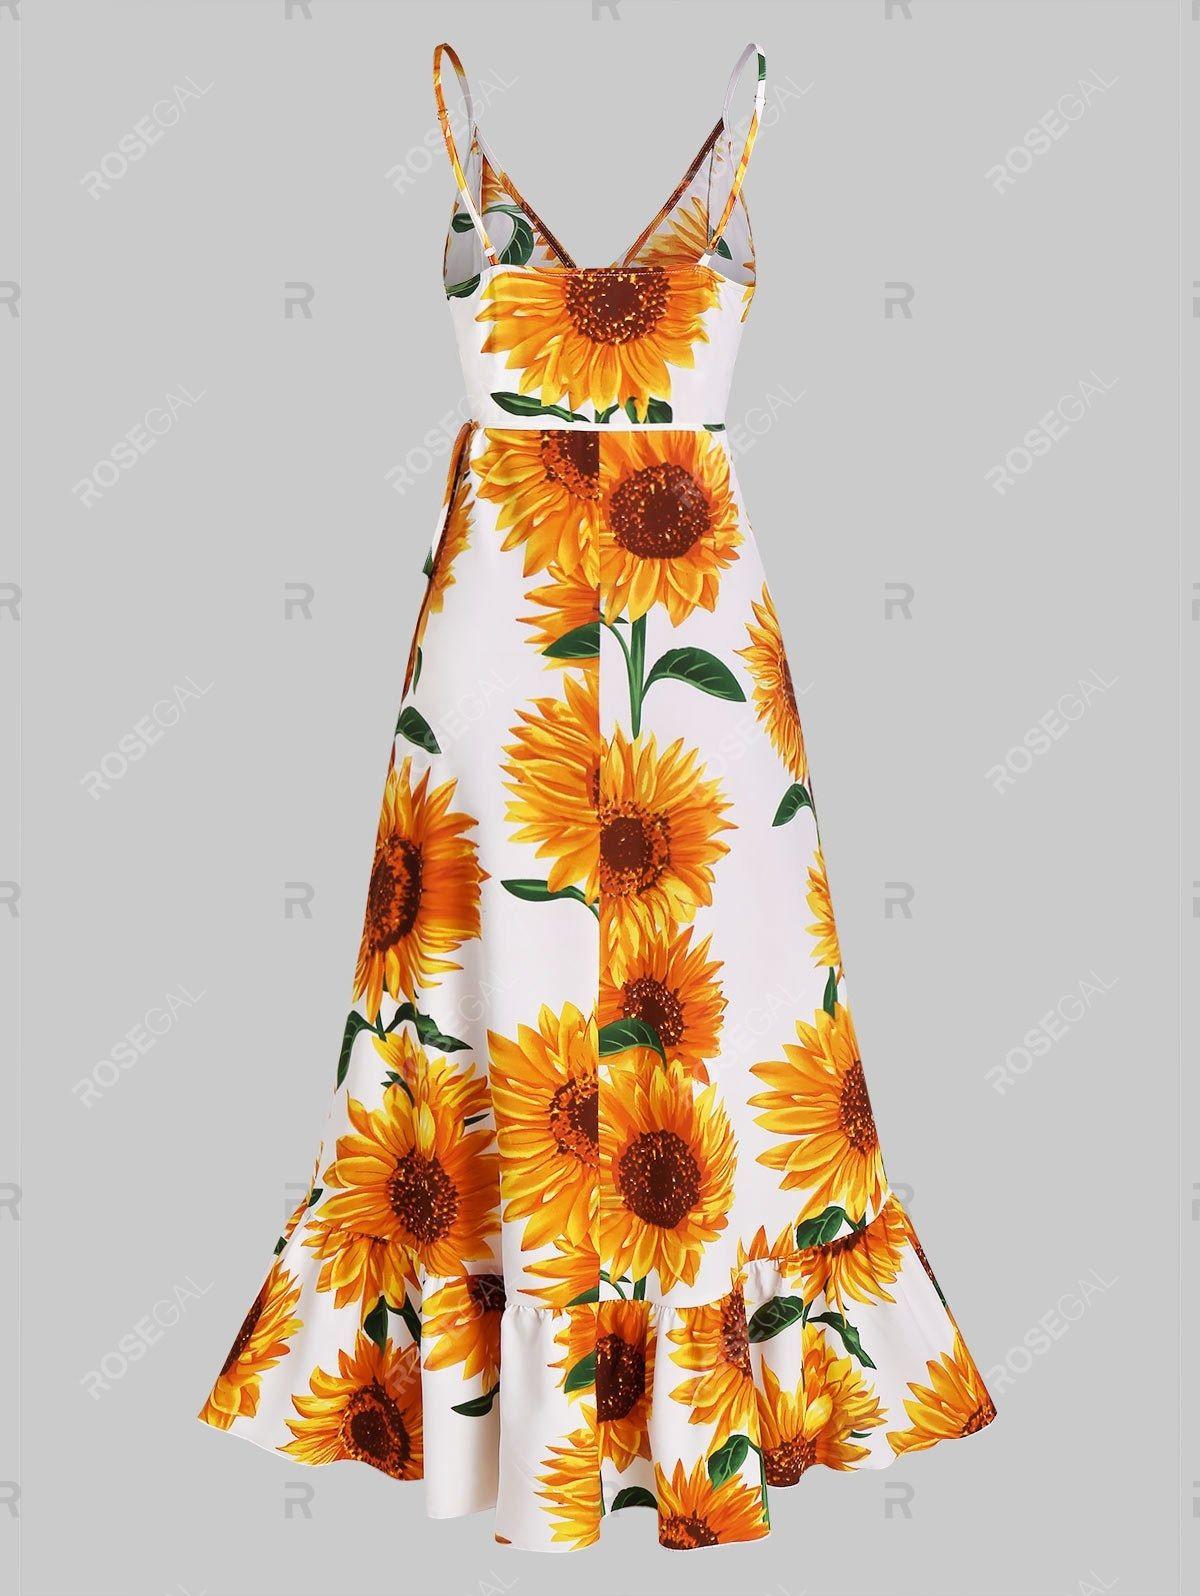 Sunflower Print Flounce Wrap Maxi Dress Ad Affiliate Flounce Print Sunflower Dress Maxi Maxi Wrap Dress Maxi Dress Dresses [ 1596 x 1200 Pixel ]